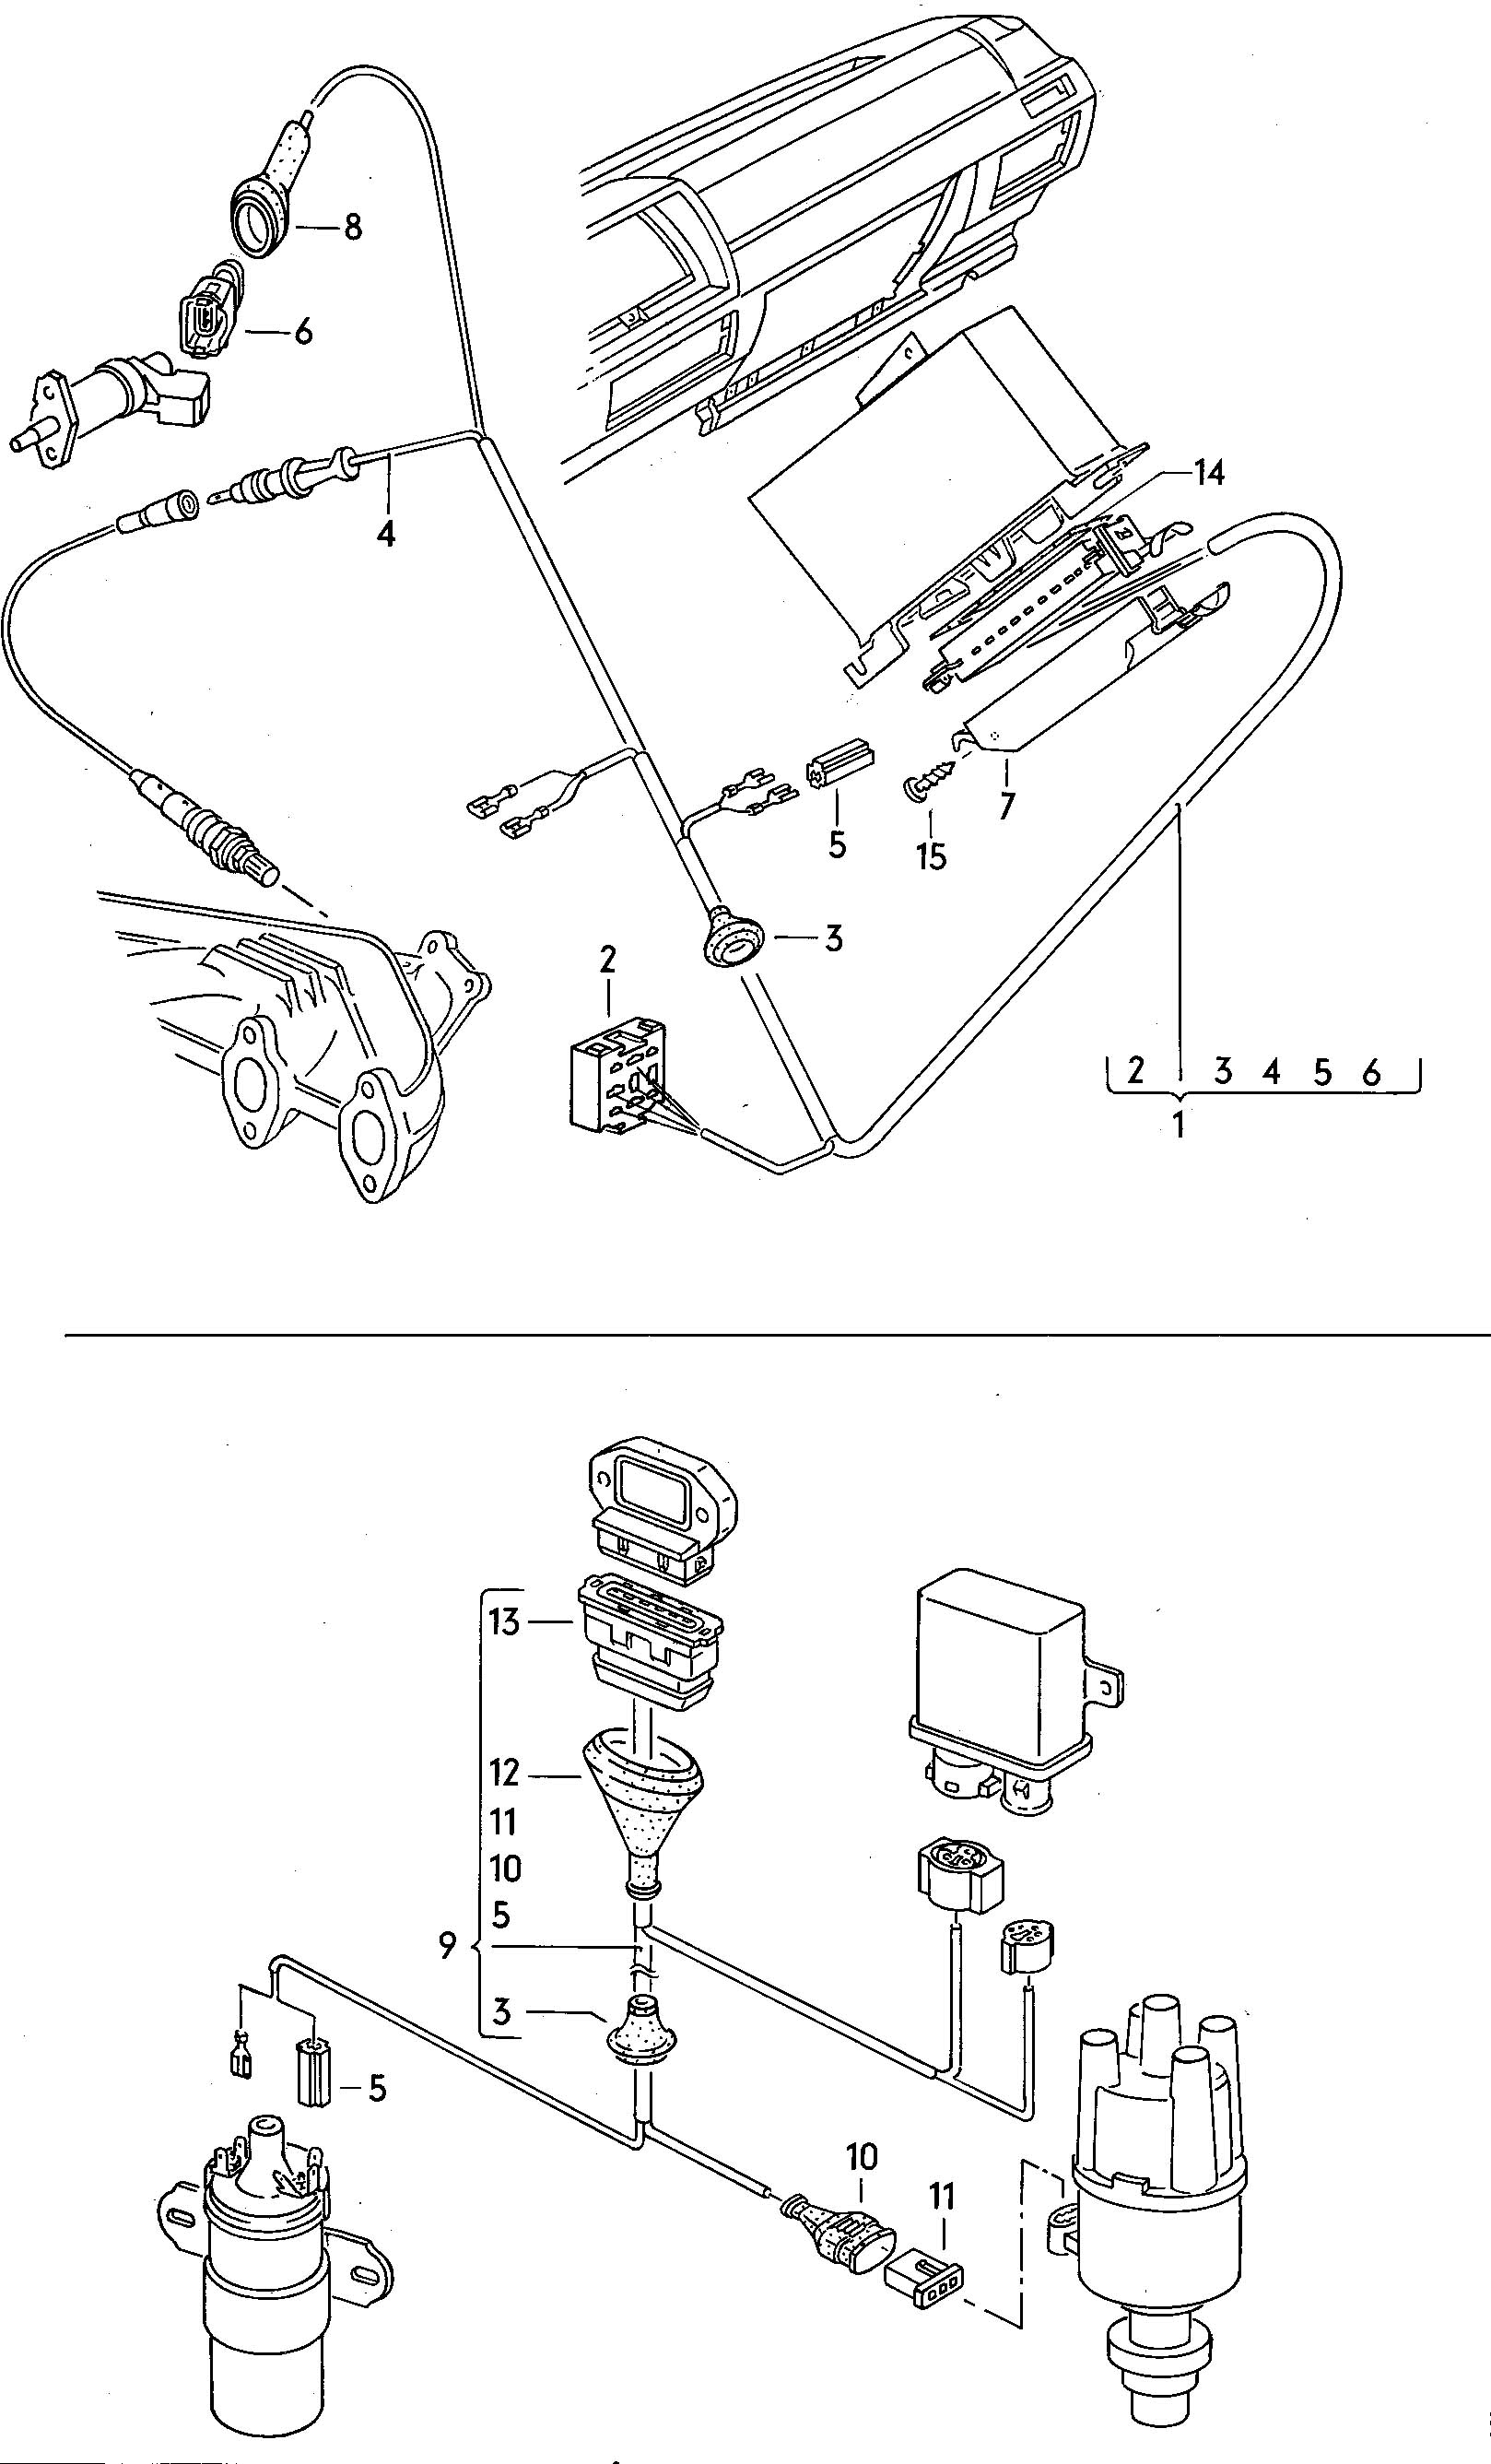 Volkswagen Vw Dasher Harness For Oxygen Sensor And